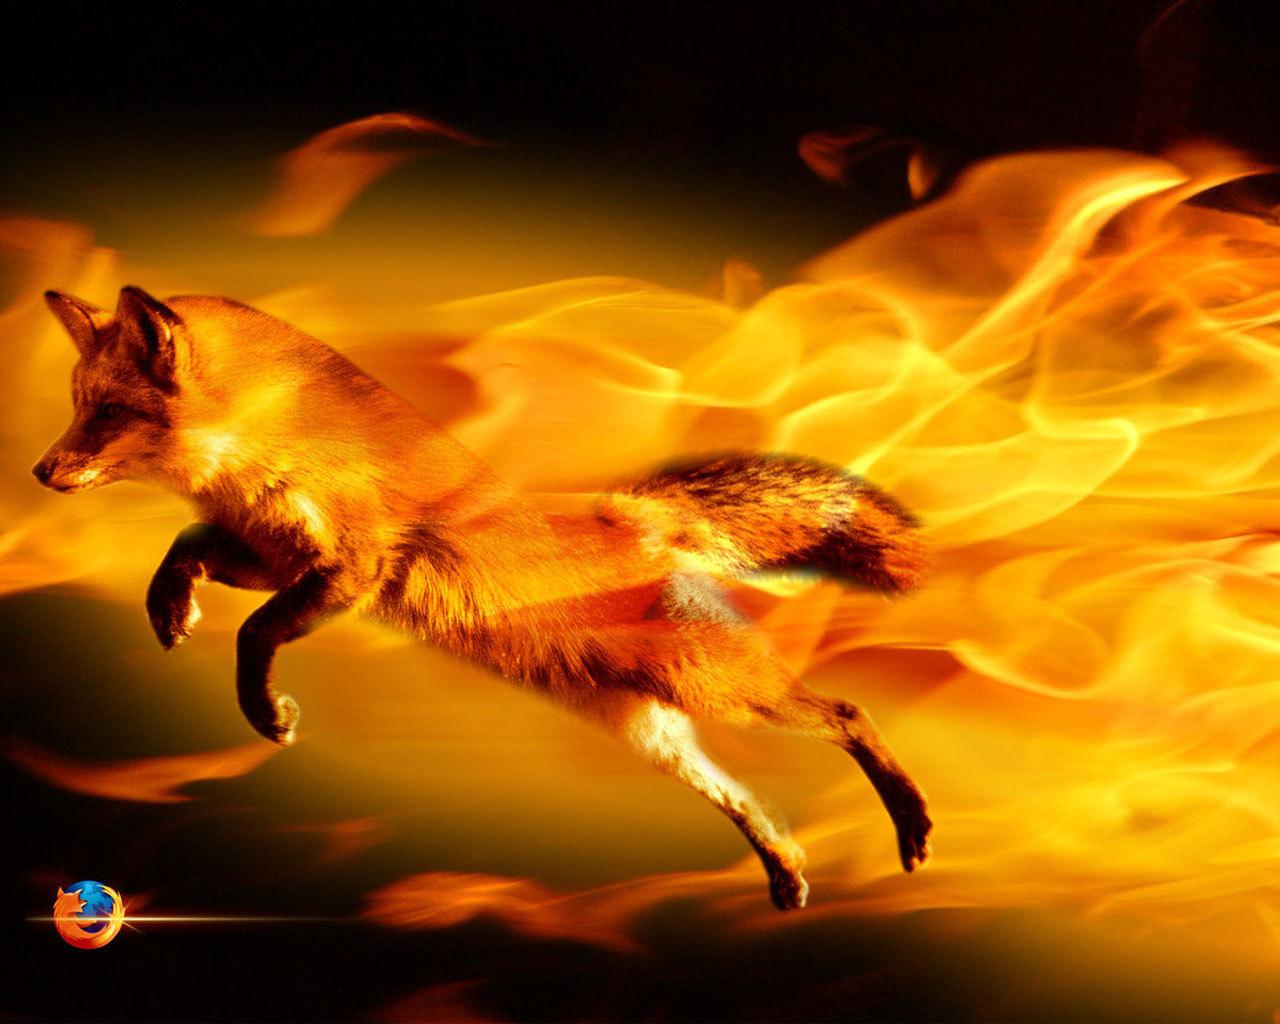 http://1.bp.blogspot.com/_BgkzdqiEW7M/TJ_MZ49kCpI/AAAAAAAAD1s/cpxZOFGQd_4/s1600/Burning-Firefox.jpg